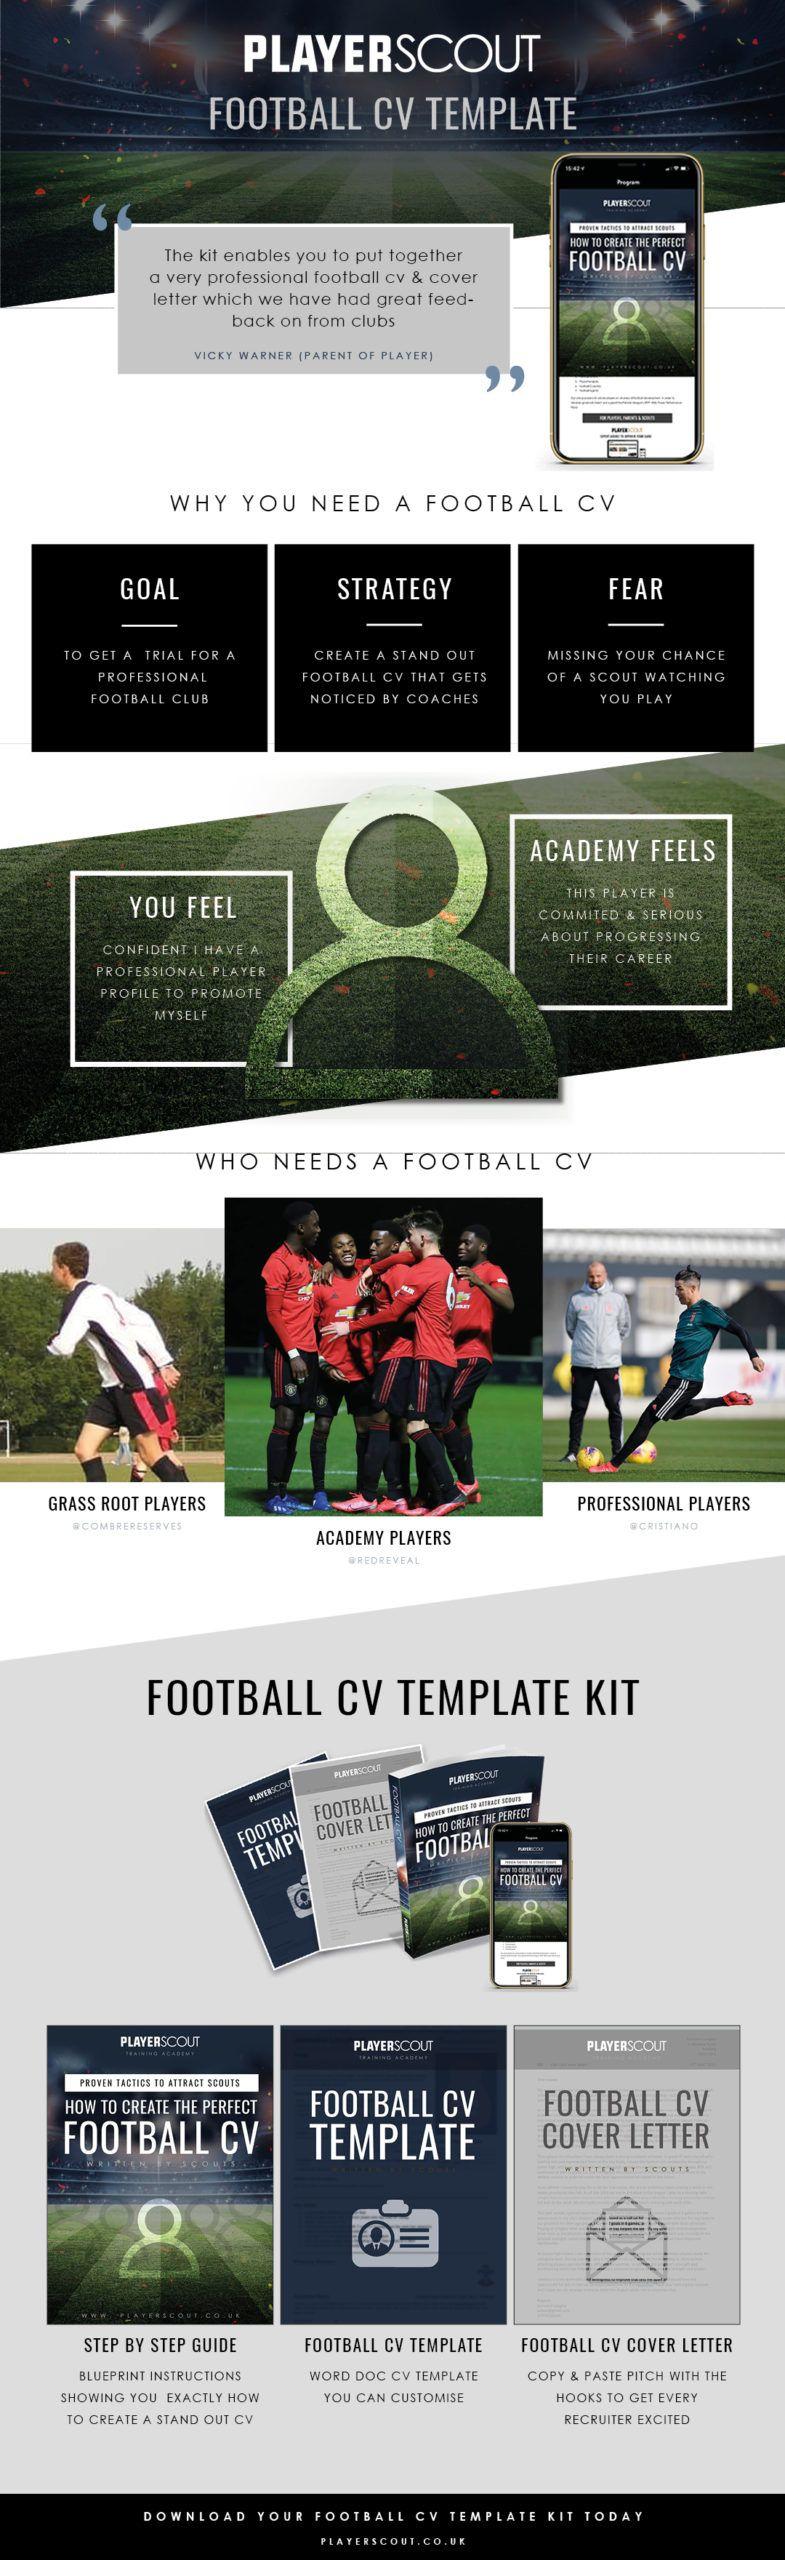 Football Cv How To Write A Football Cv 2020 Template Download Cv Template Education Logo Design Football